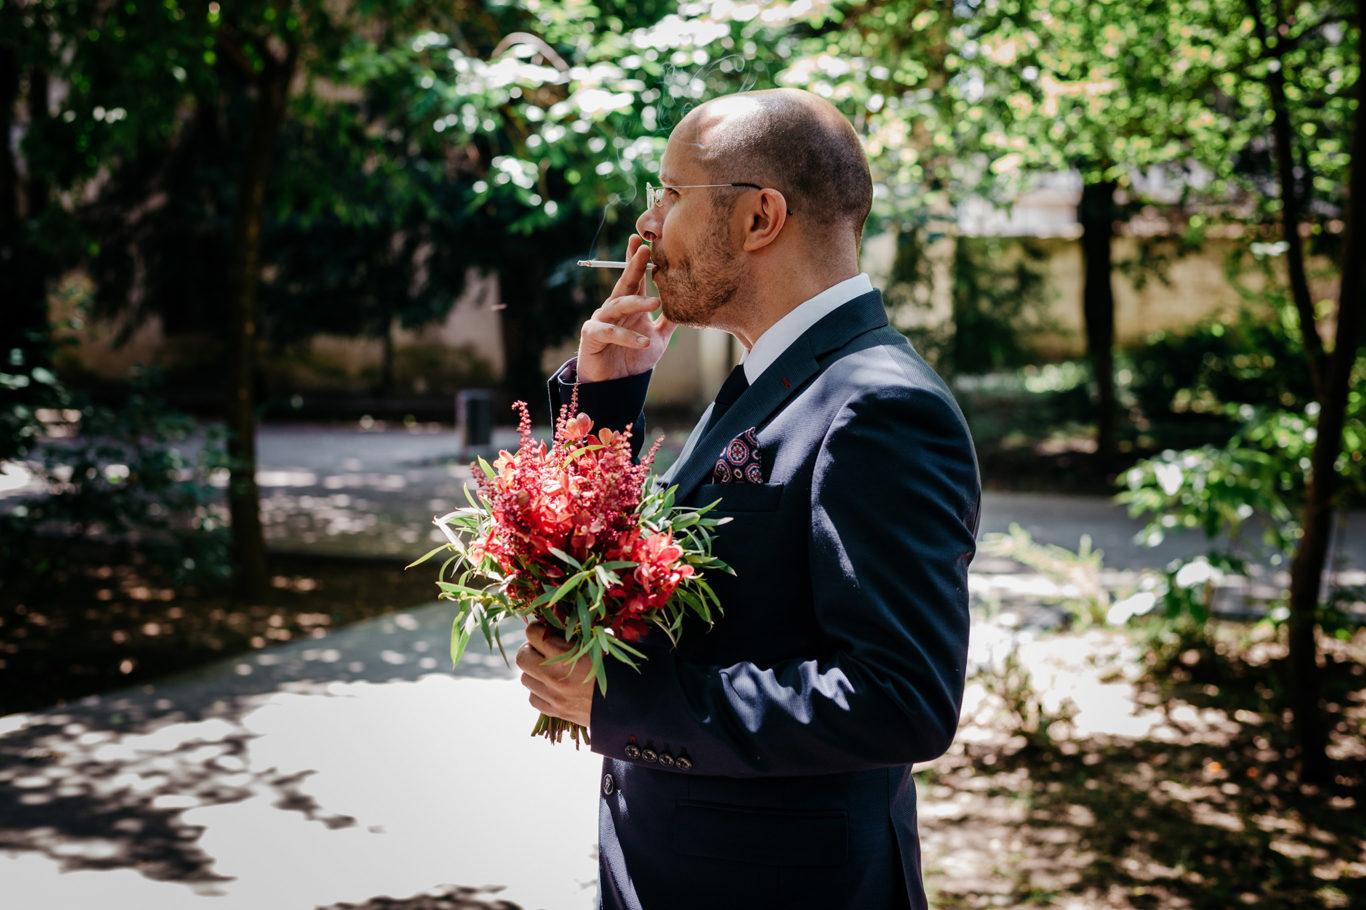 0306-fotografie-nunta-bucuresti-anca-george-fotograf-ciprian-dumitrescu-dsc_8353